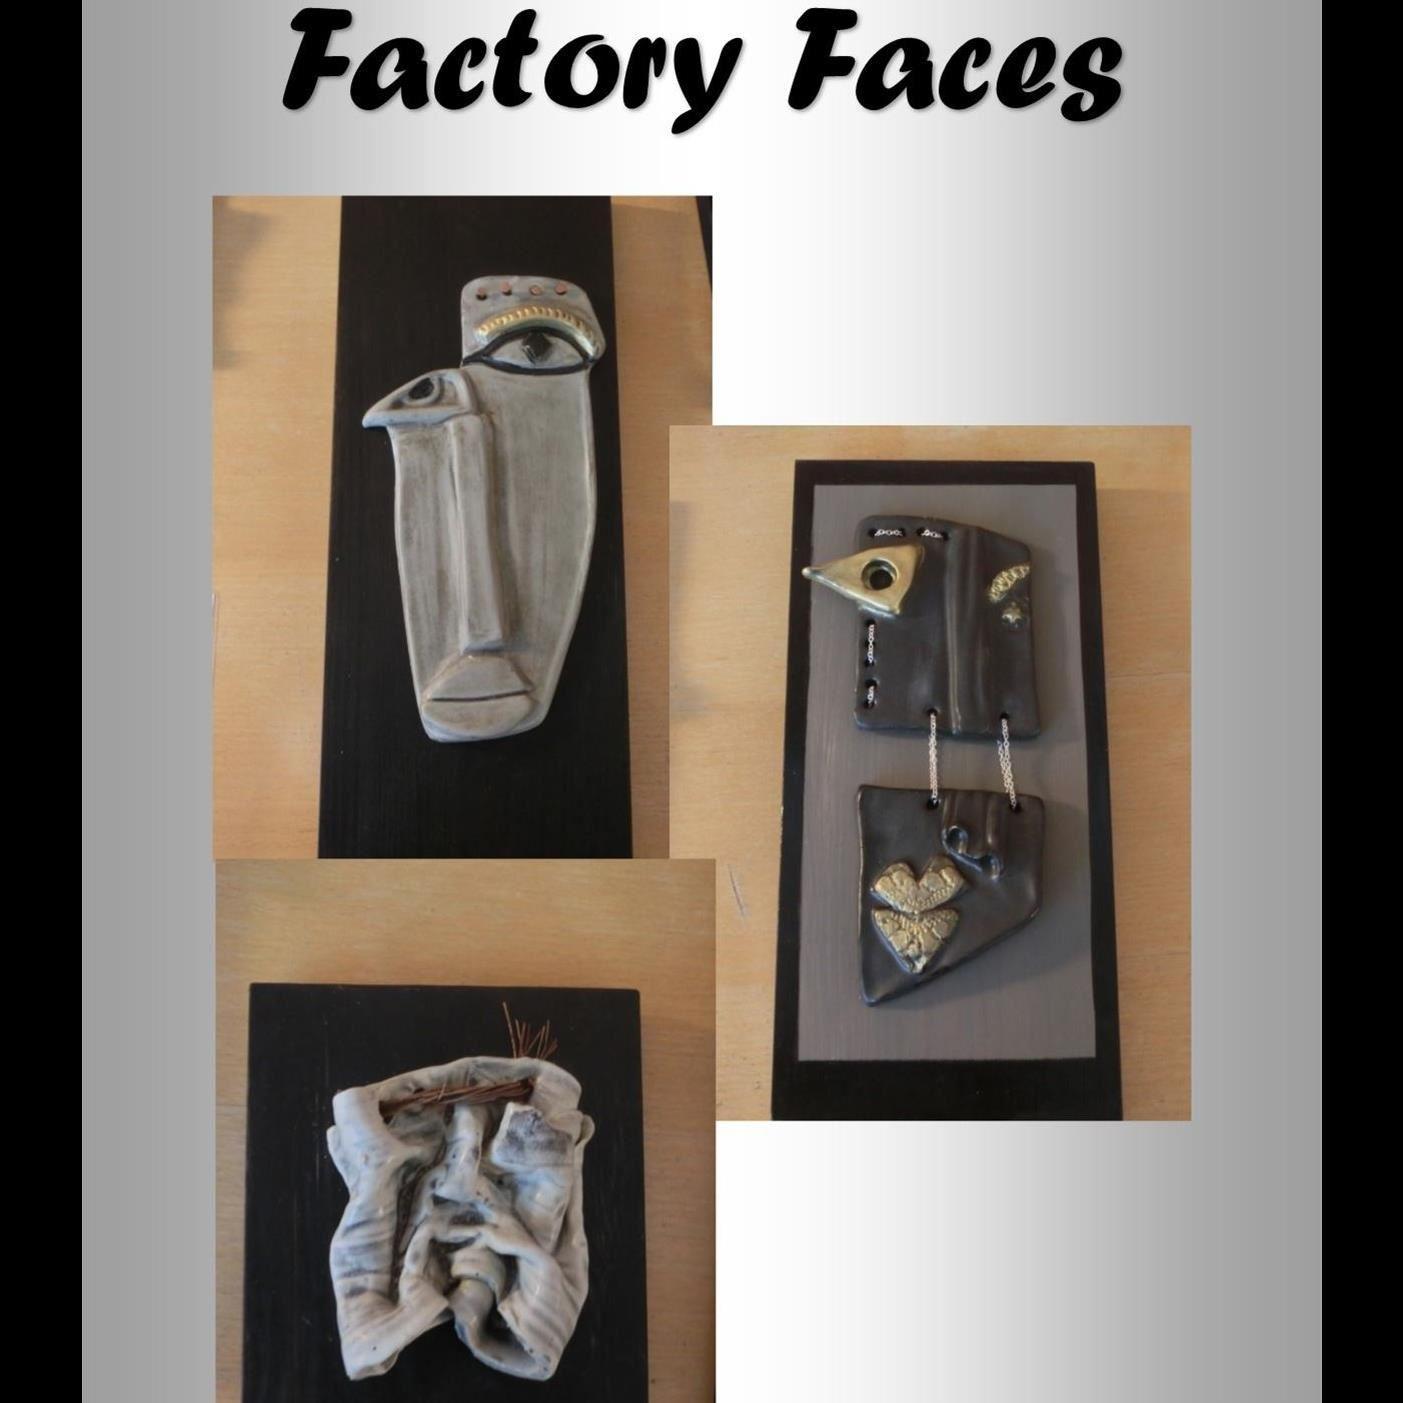 Factory faces